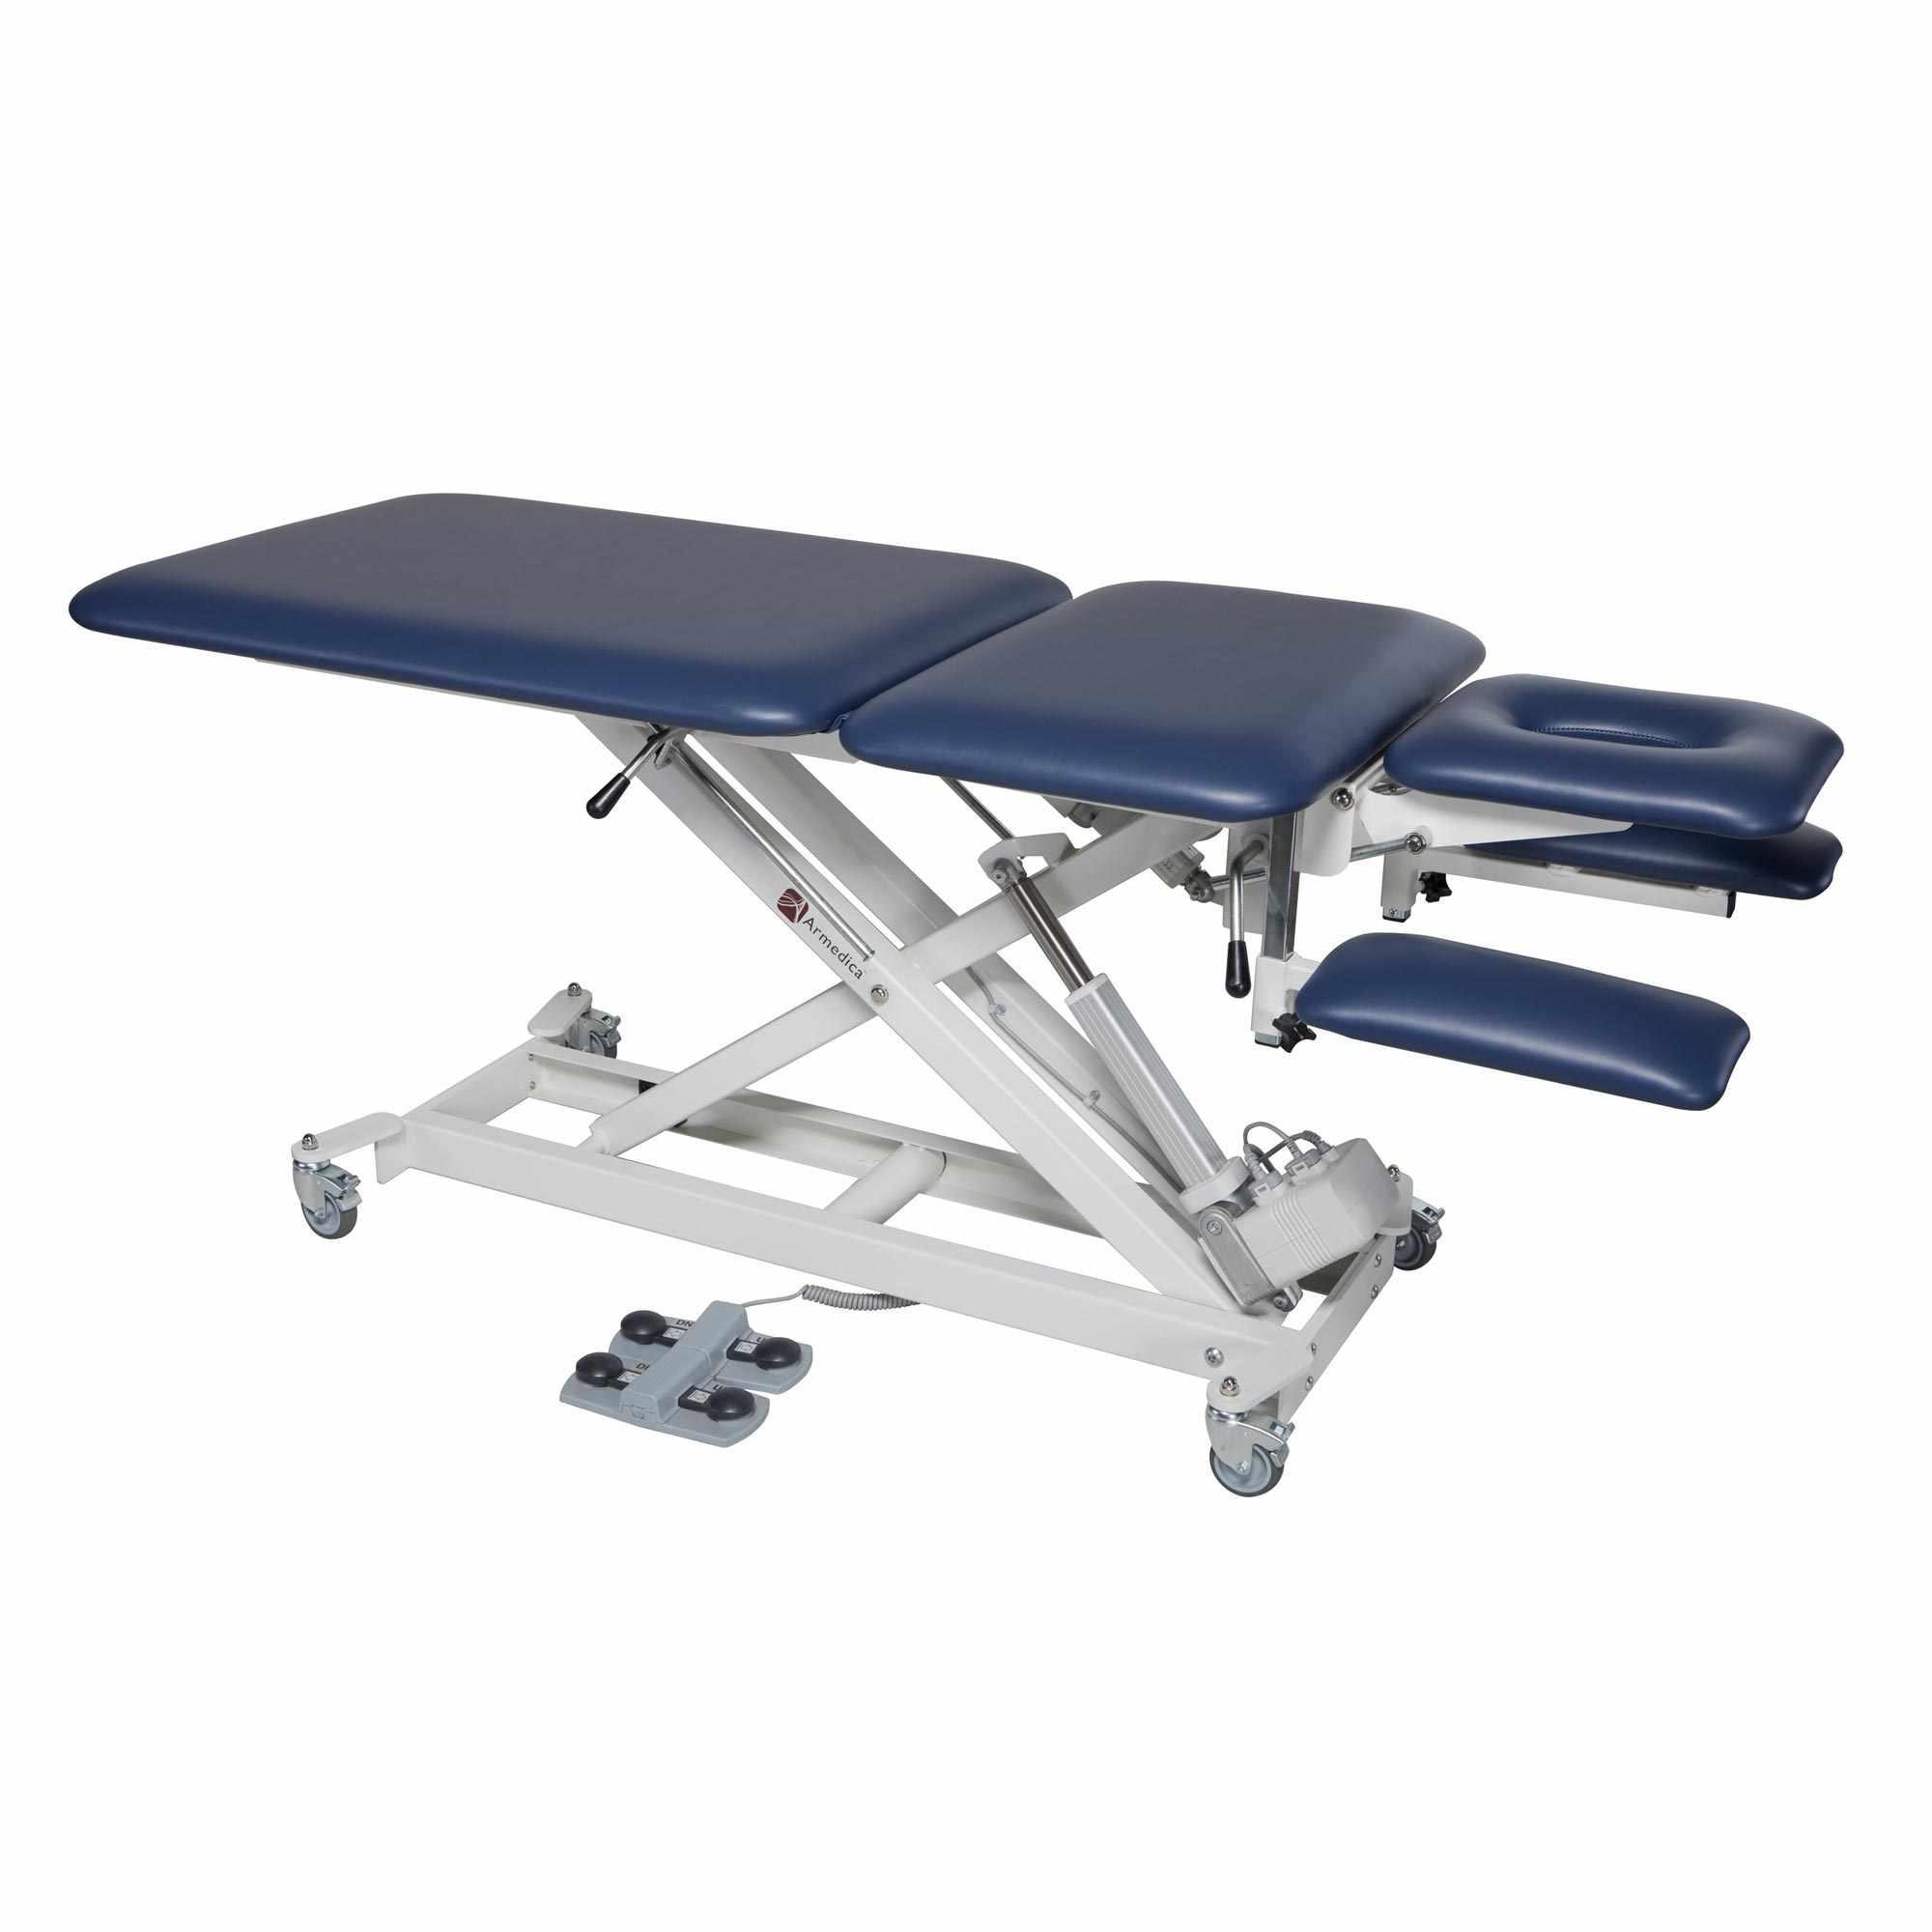 Armedica AM-BAX 5000 treatment table